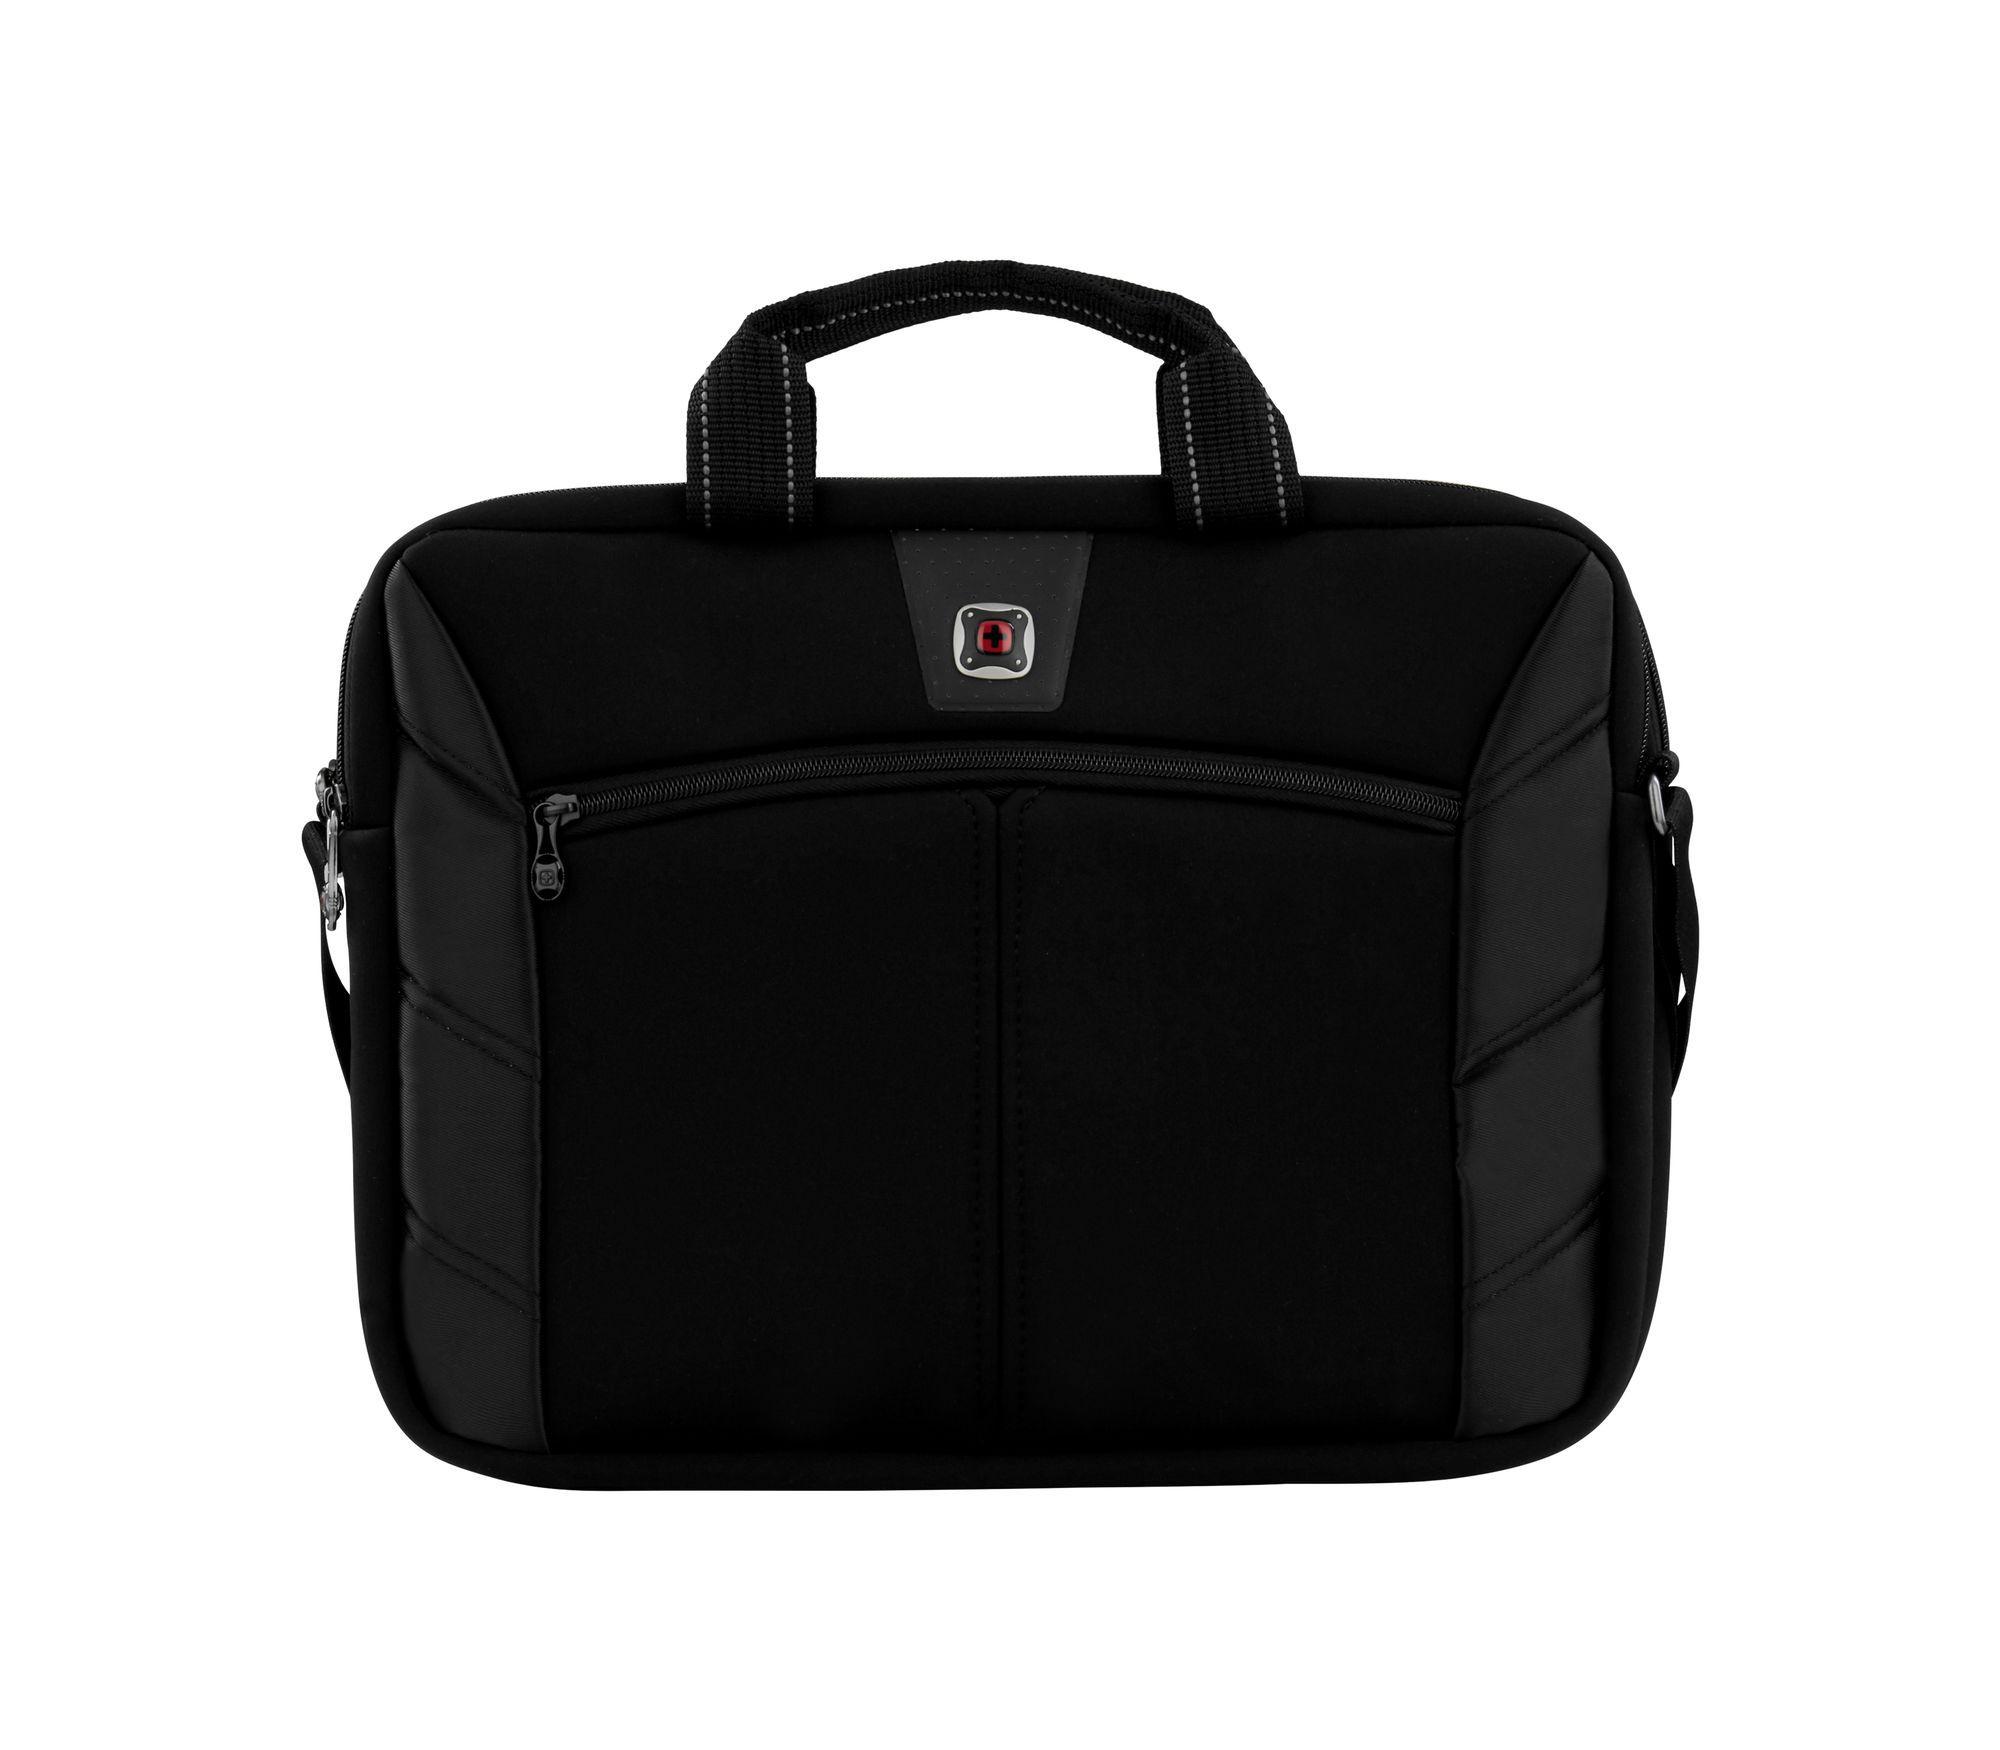 Slimcase para laptop de 16 '' com bolso para tablet  - Preto - Wenger